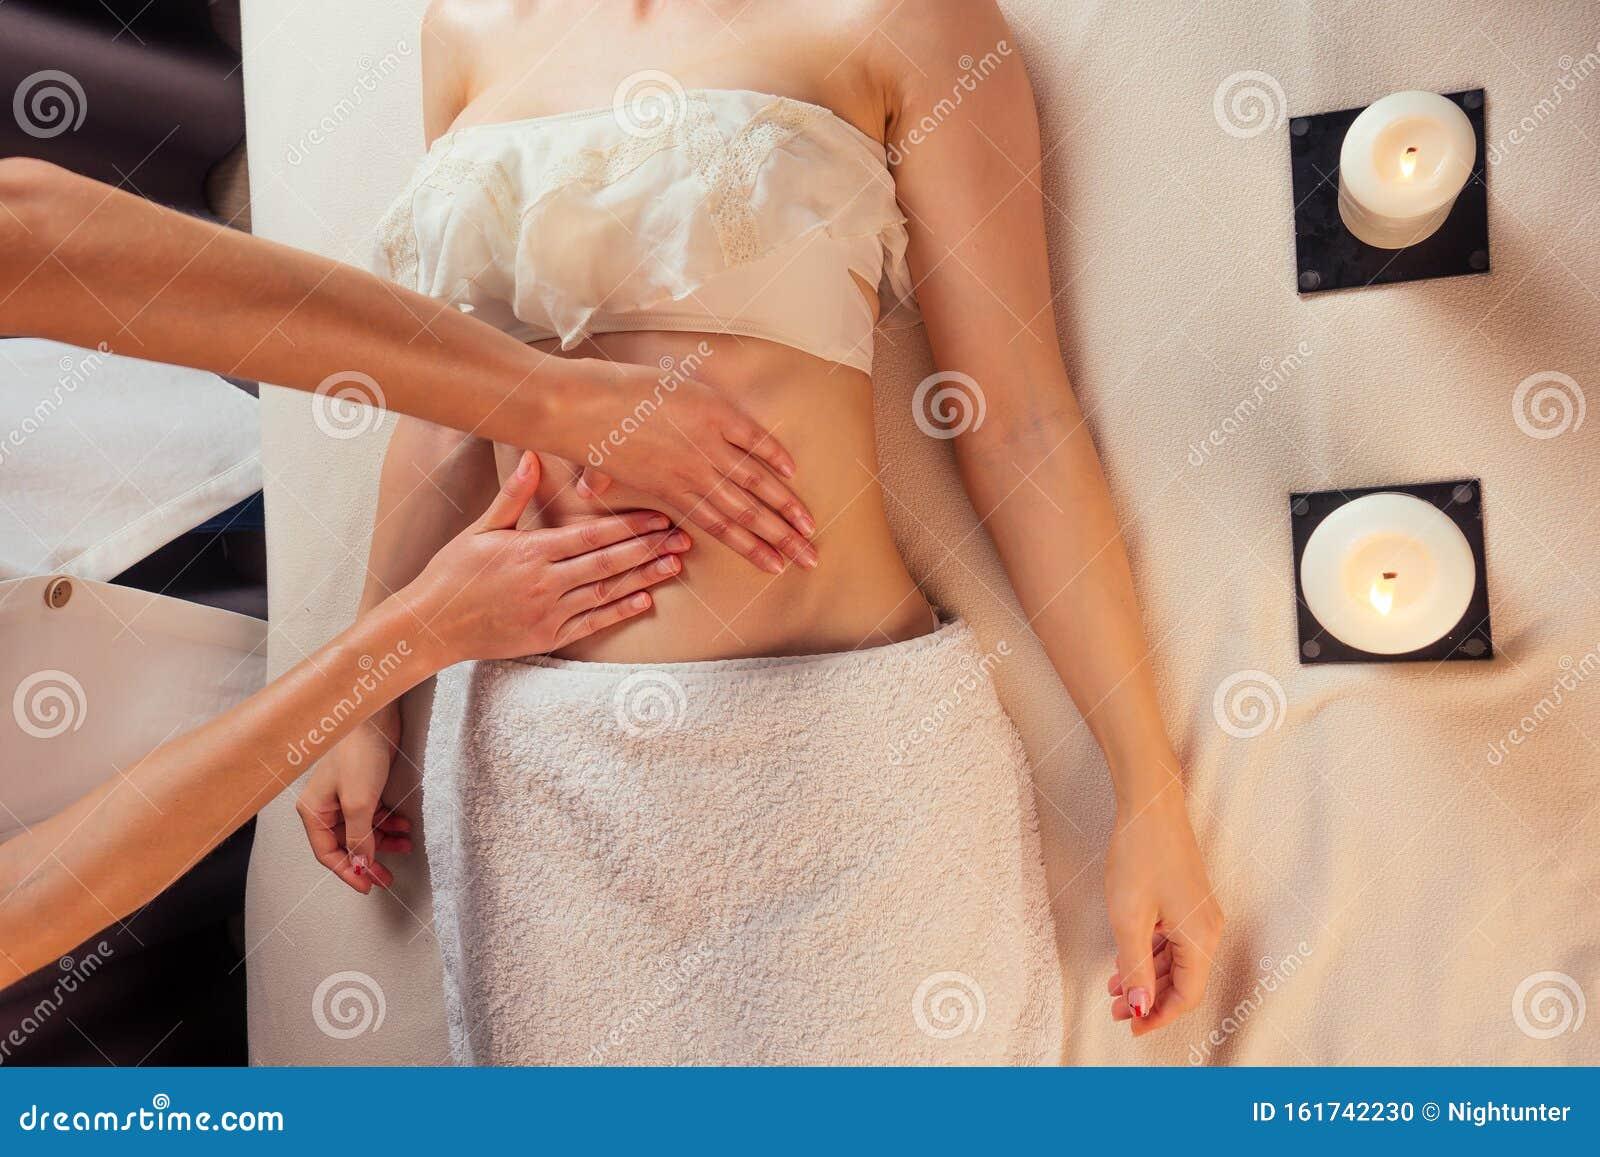 Massage tantra wellness risk during